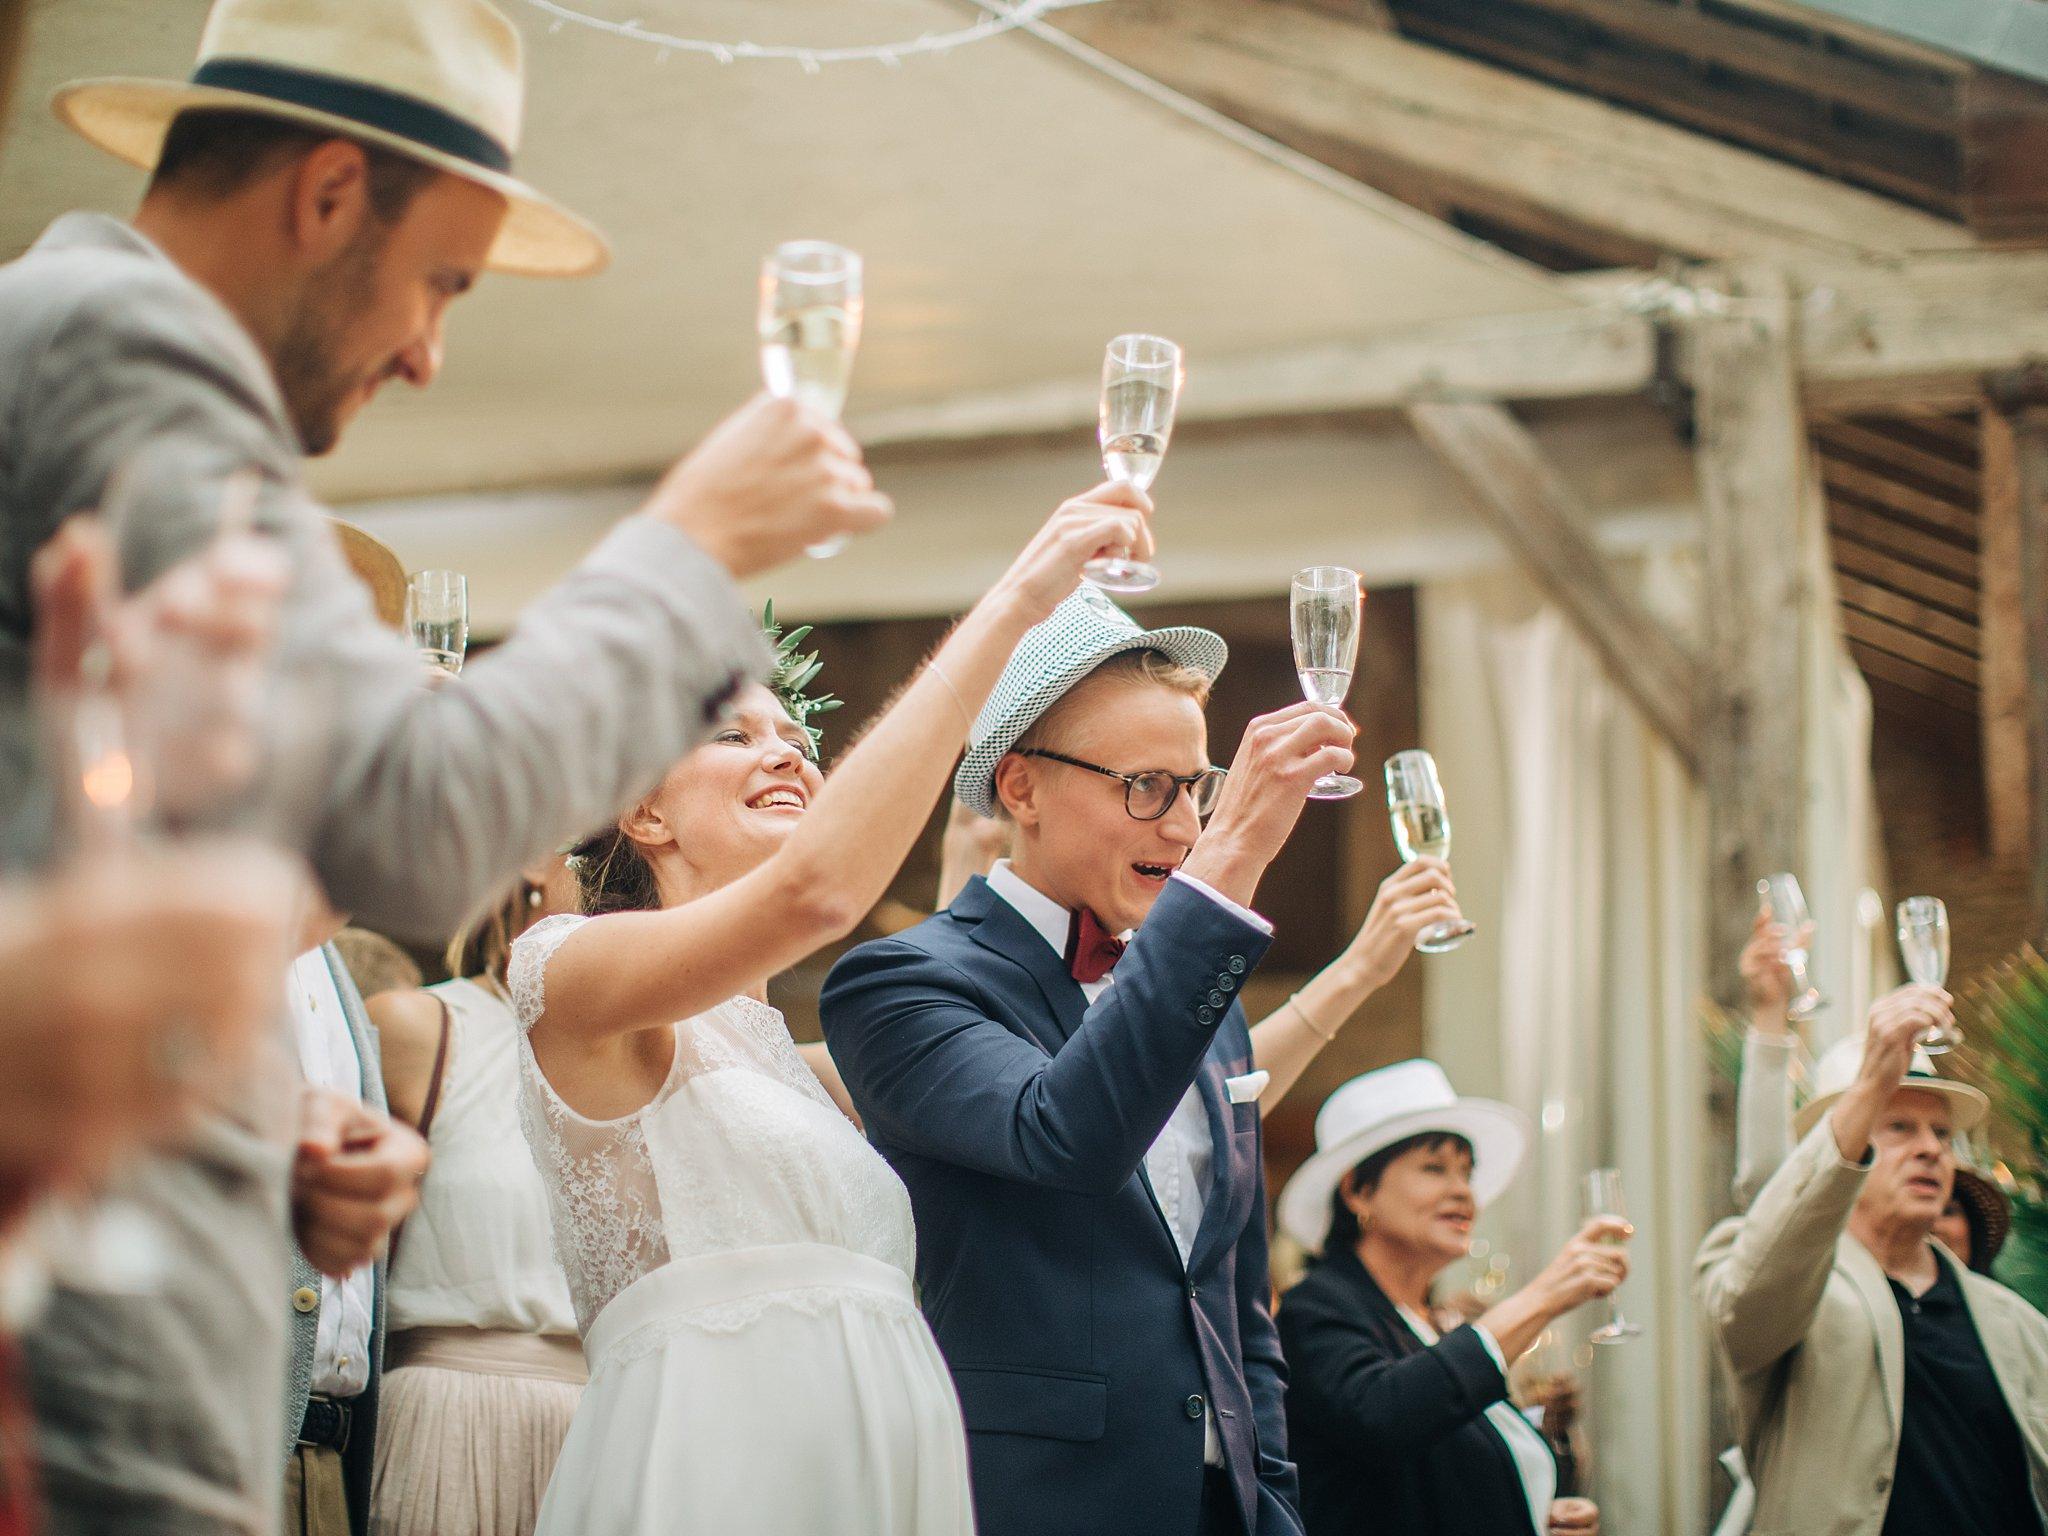 Wedding Photographer Perpignan - Château Las Collas Wedding - Hugo Hennequin076.jpg